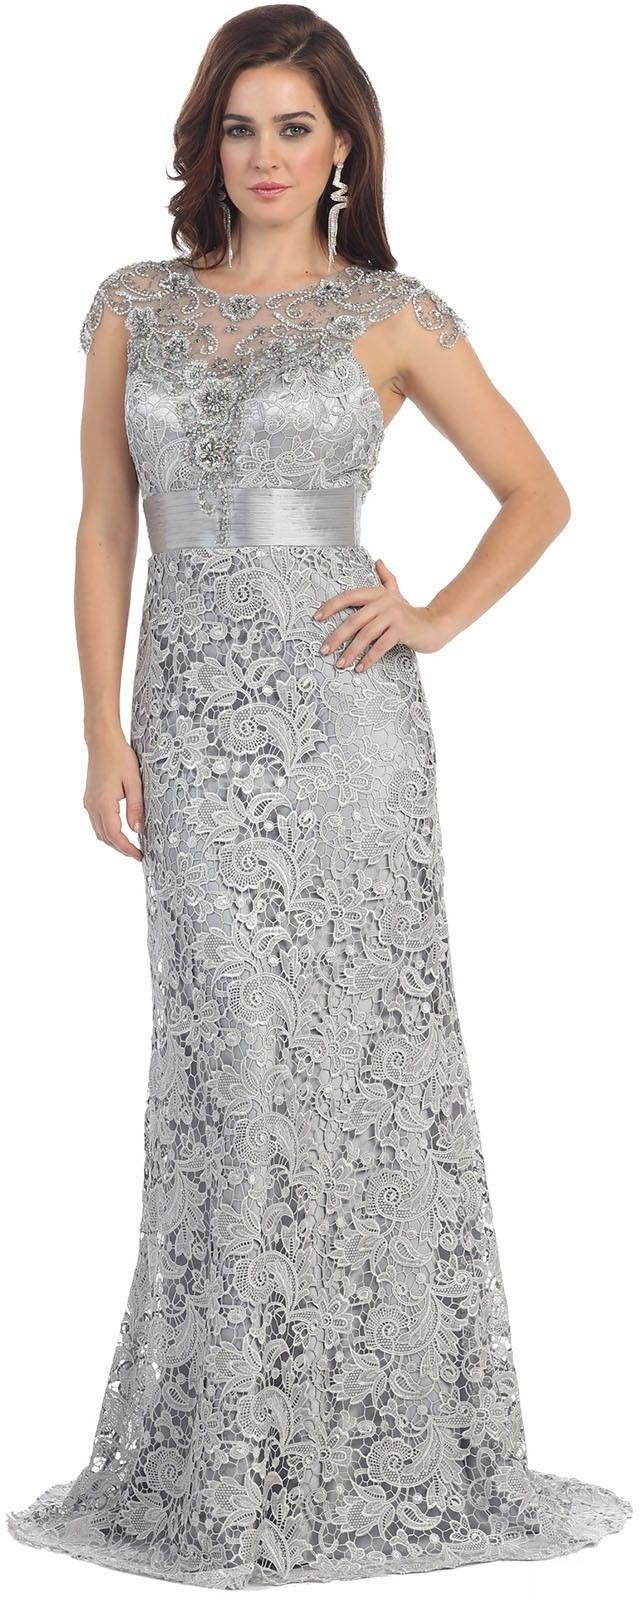 9f89a2acb539 Lace bridesmaid dress Walmart